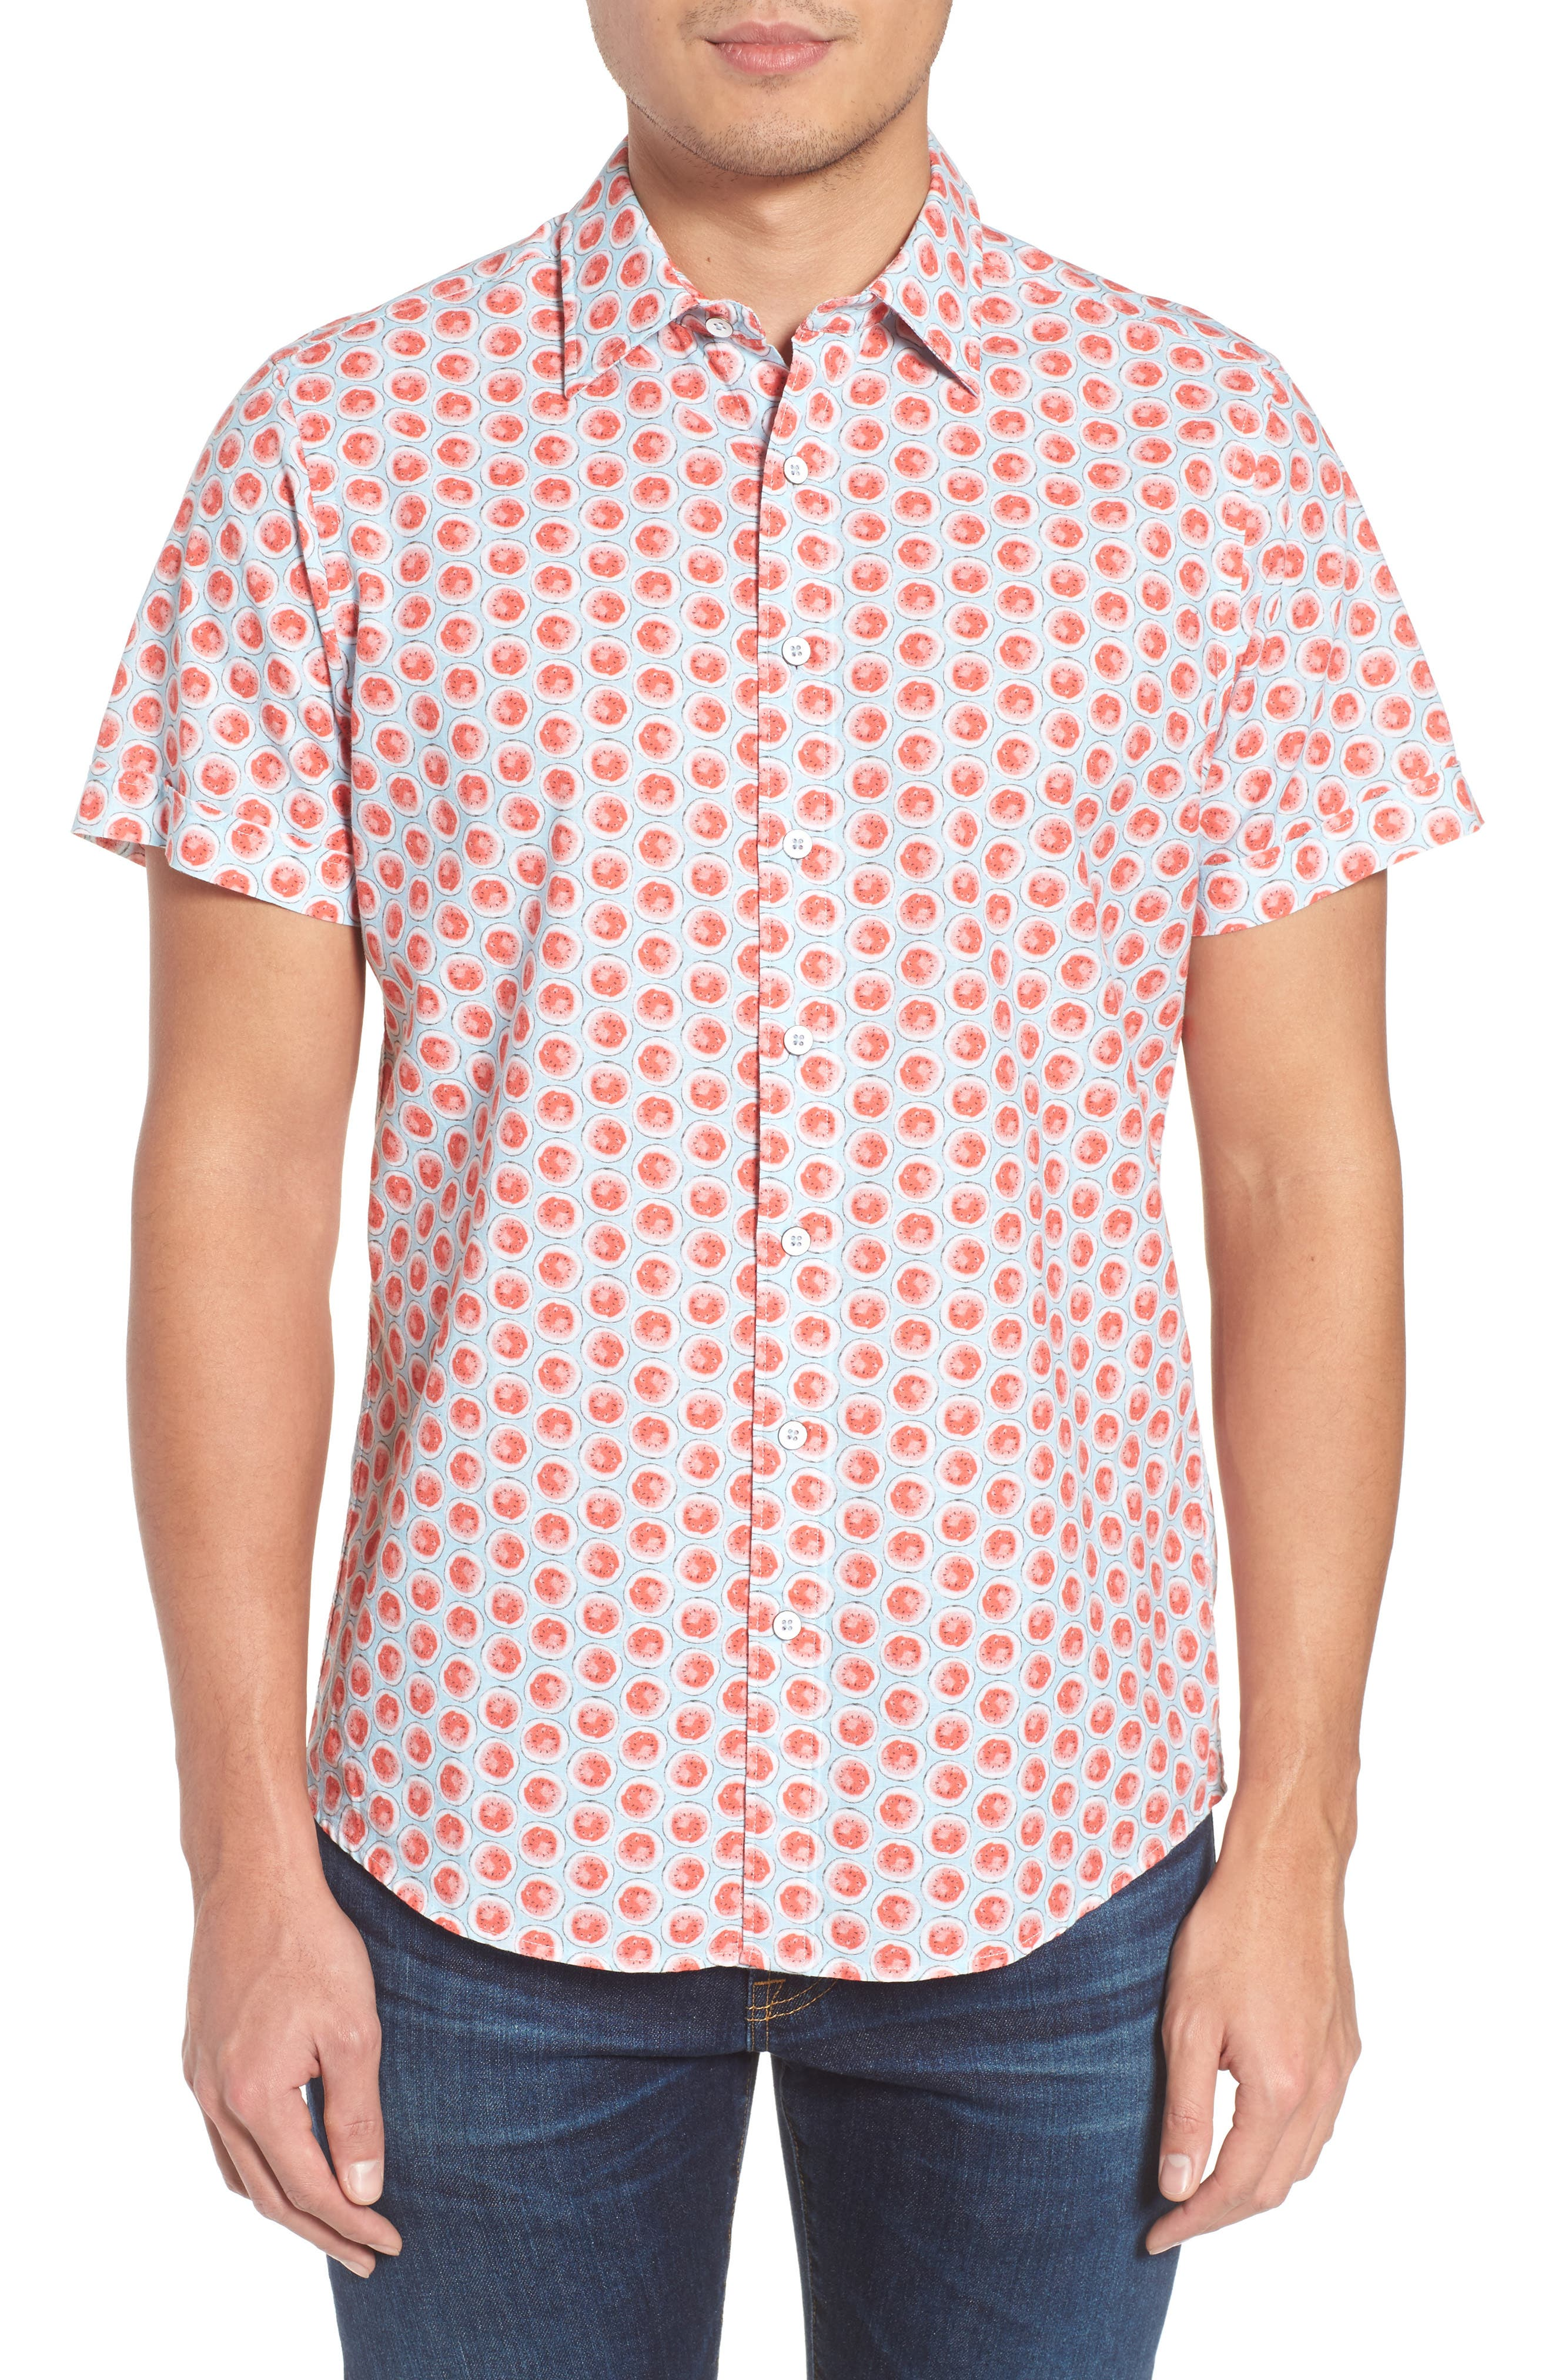 Mellons Bay Regular Fit Sport Shirt,                             Main thumbnail 1, color,                             Watermelon